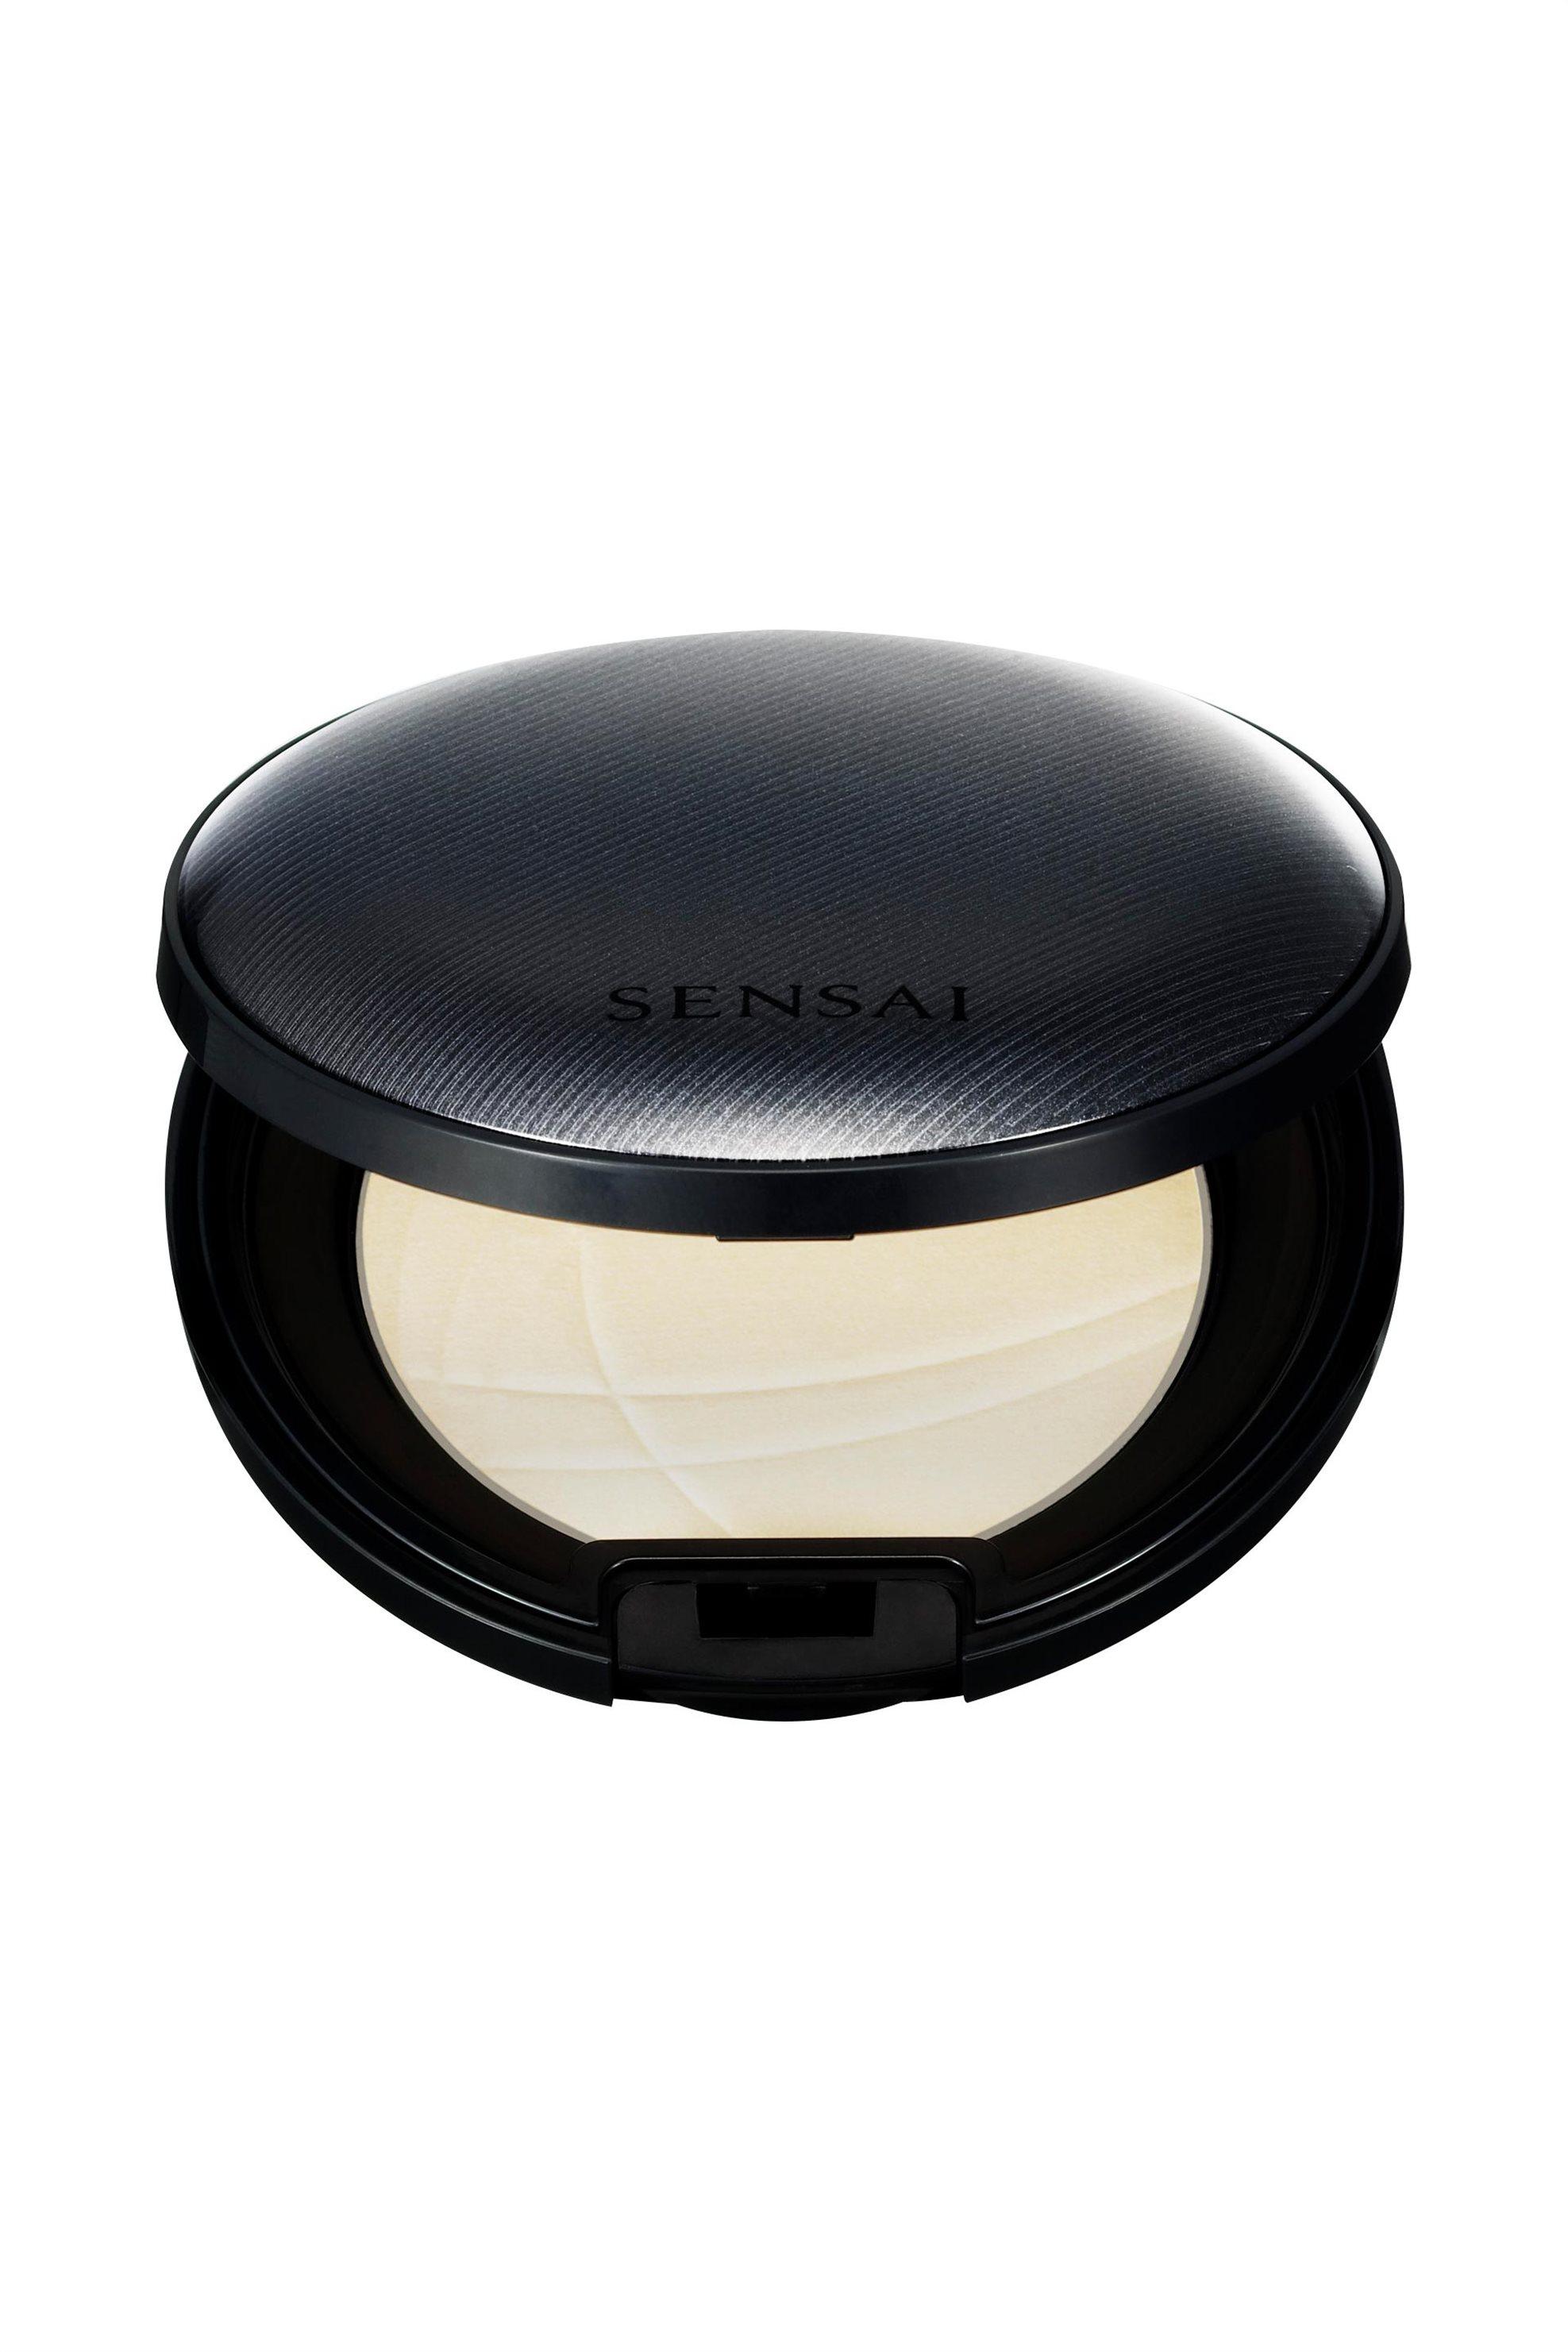 Sensai Silky Highlighting Powder 5 gr. - 96981